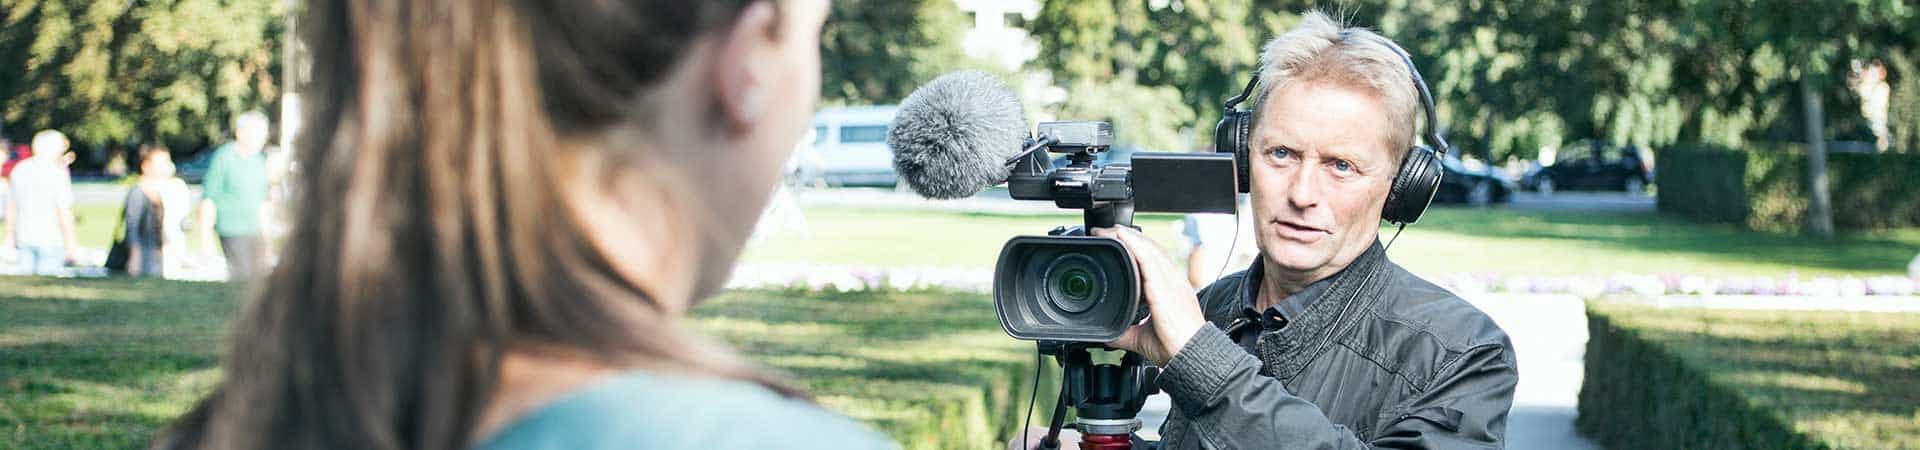 Videoproduktioner